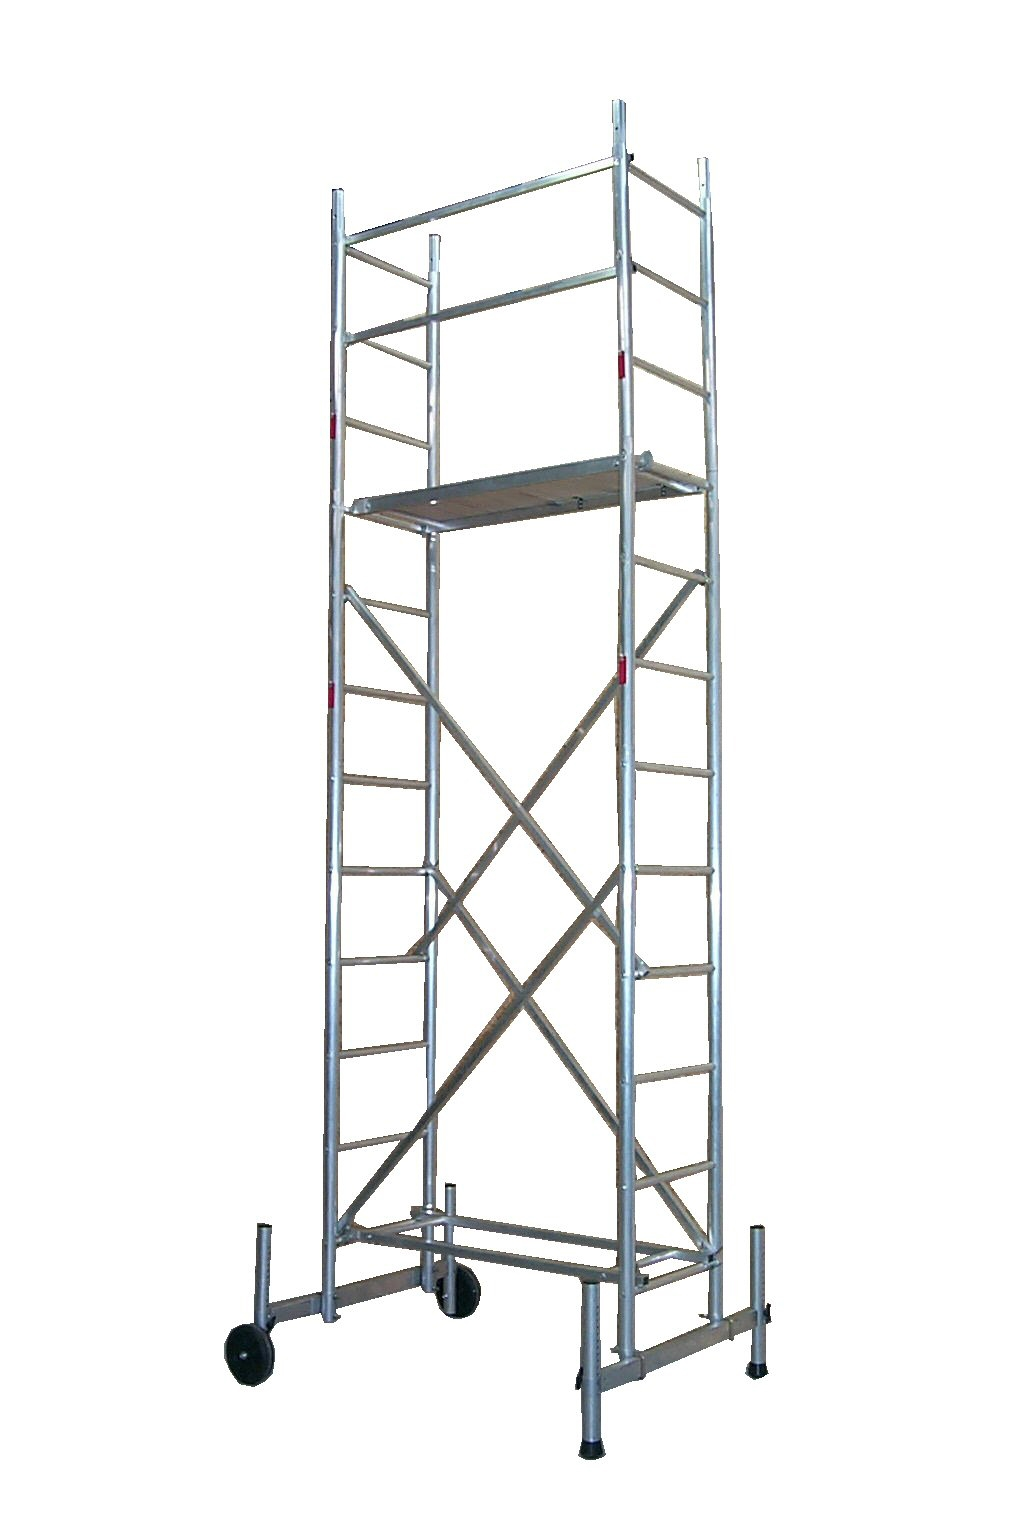 echafaudage roulant aluminium hauteur travail 5 m. Black Bedroom Furniture Sets. Home Design Ideas